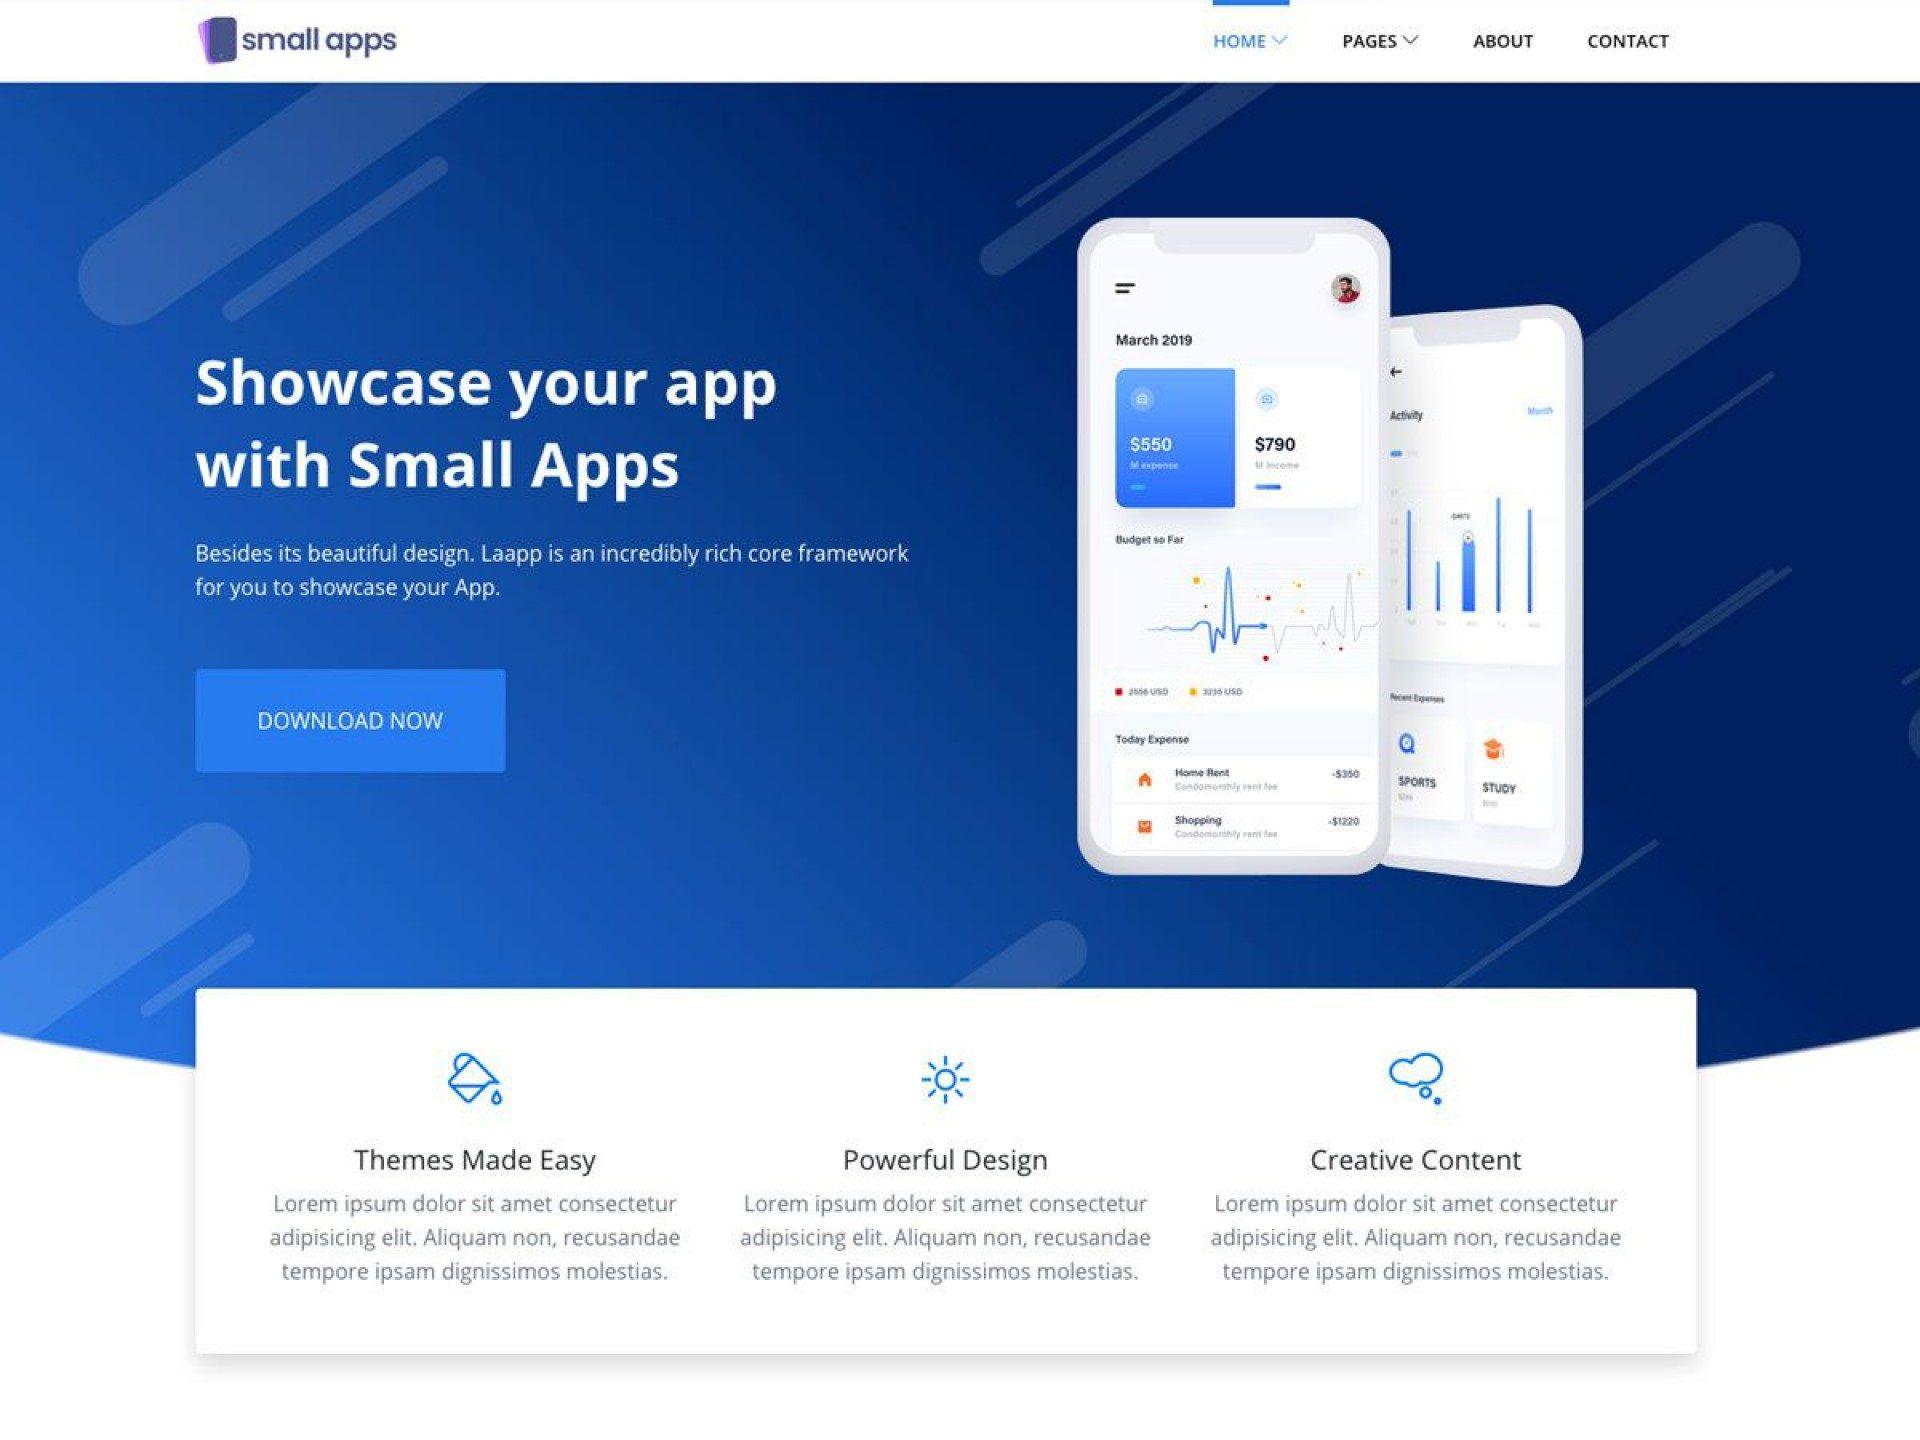 005 Rare Csvape Esponsive Mobile App Landing Page Html Template Free Download High Resolution  Csvape-responsive-mobile-app-landing-page-html-templateFull